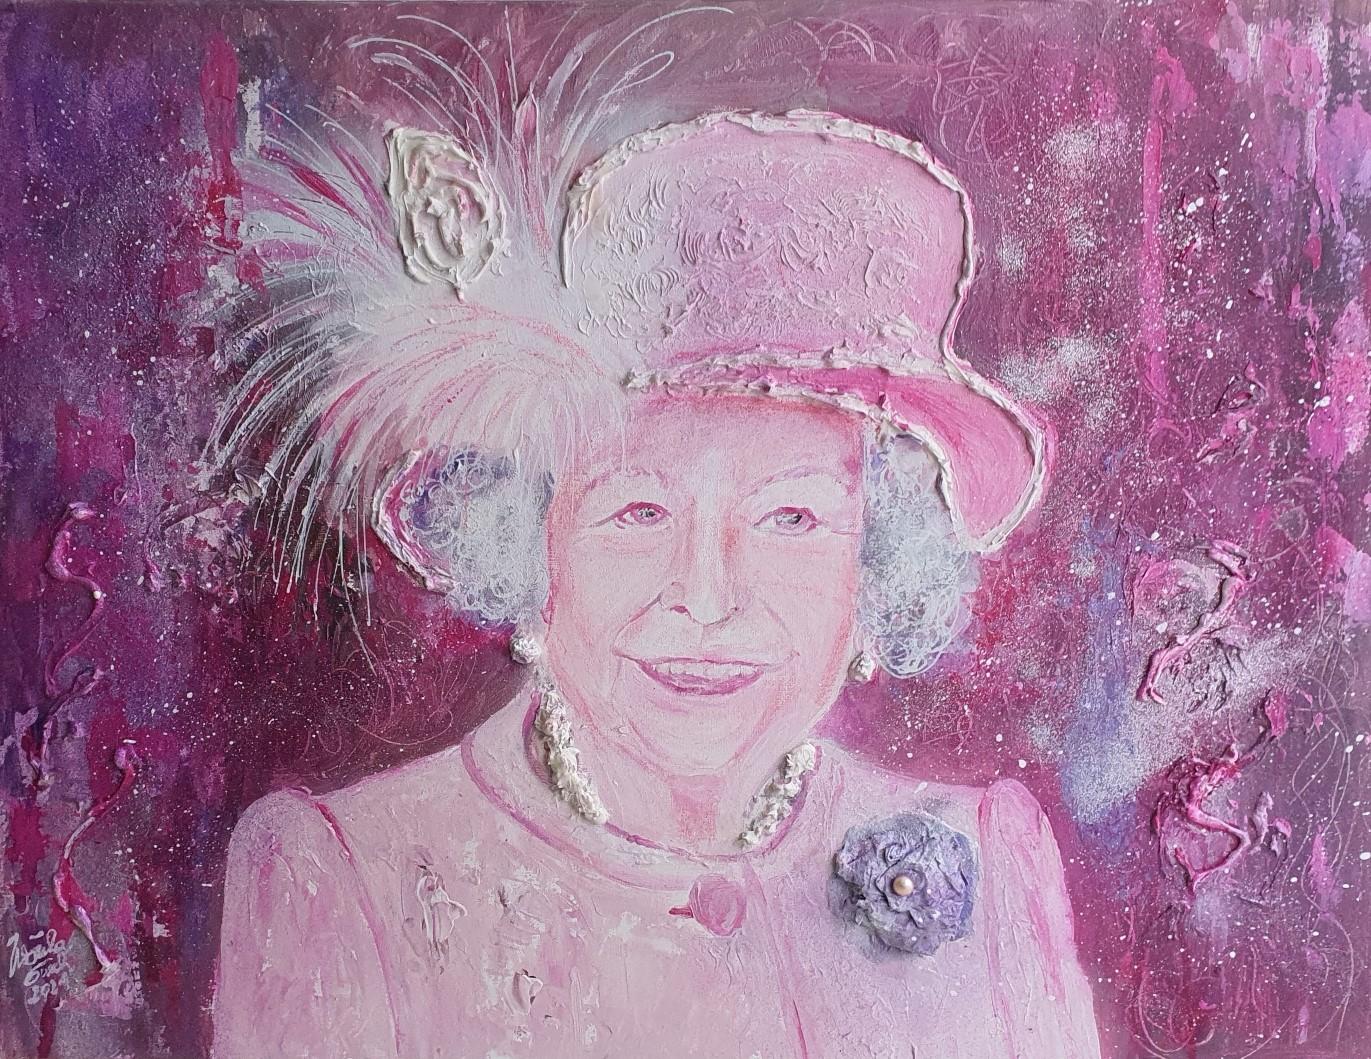 The unique Queen Elizabeth II. (Technik: Acryl, Zement pp. auf Leinwand 60 X 80 X 1,5 cm)